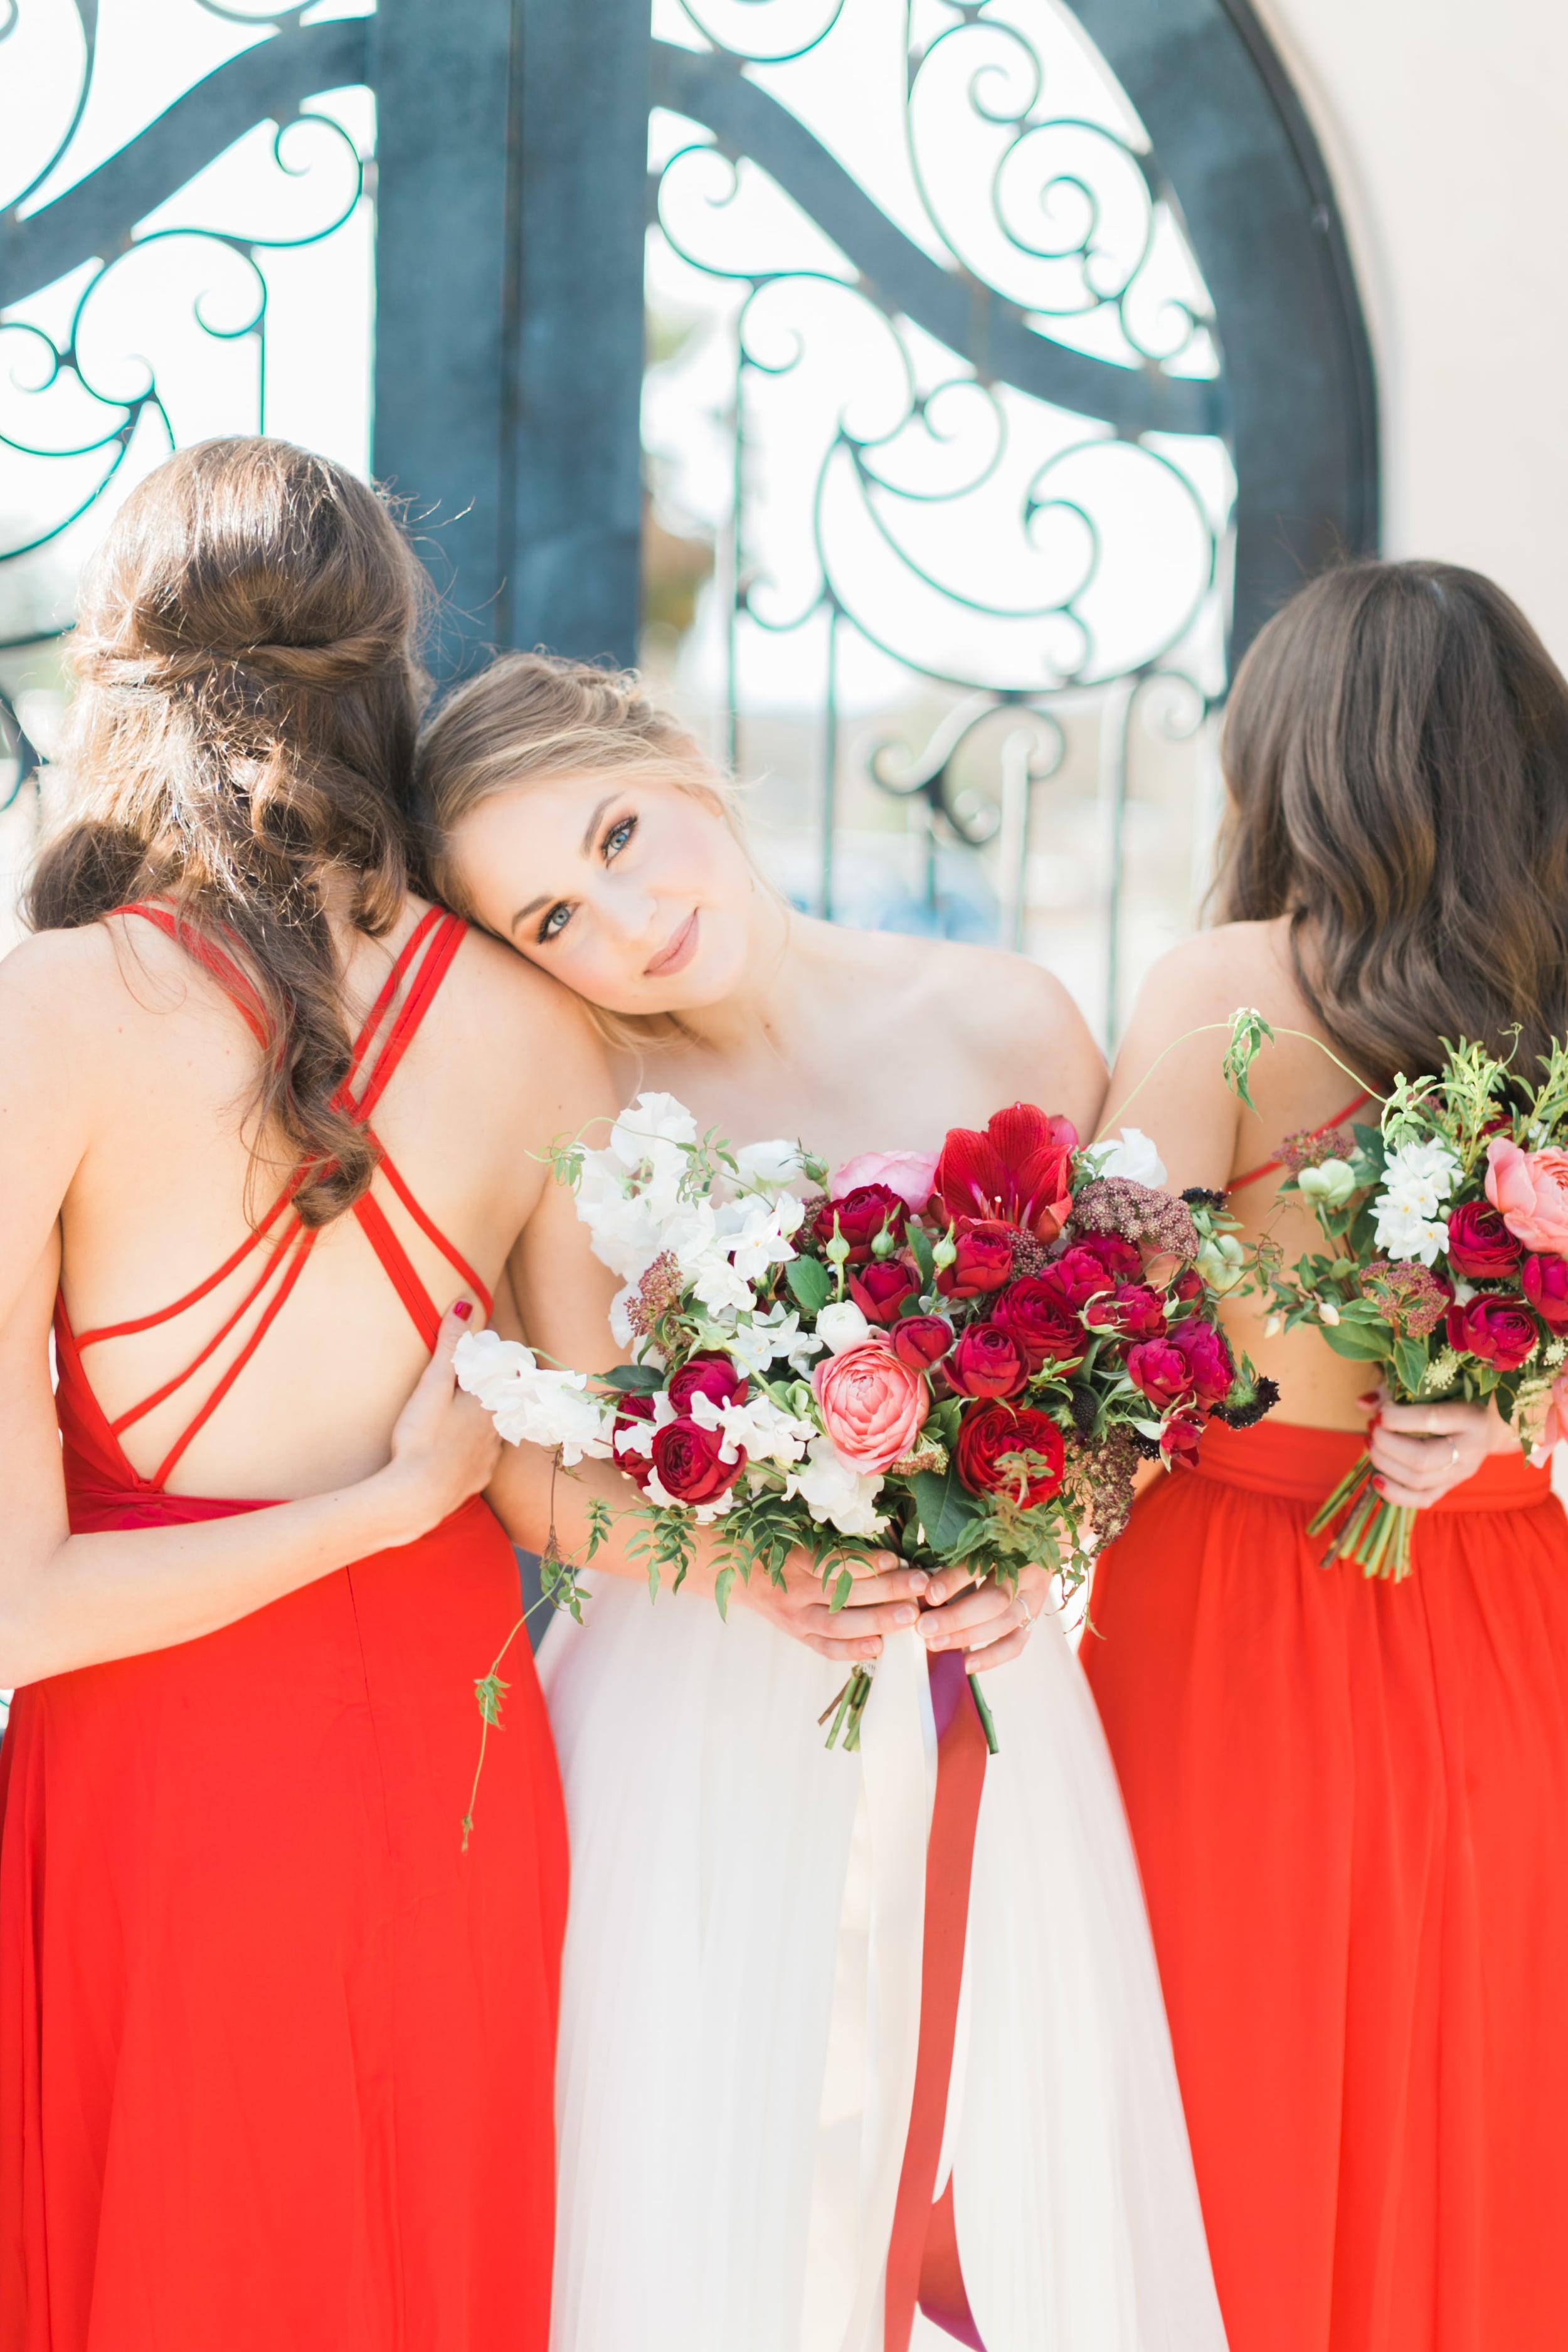 Natalie_Schutt_Photography_Winter_Wedding_San_Luis_Obispo-50.jpg